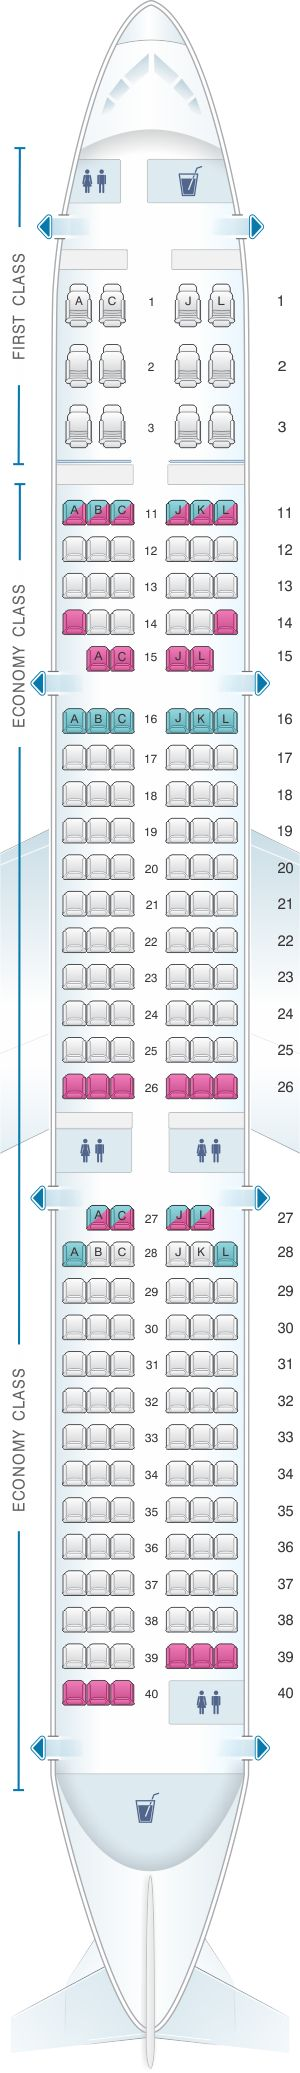 Seat Map Air China Airbus A321 200 Config. 1